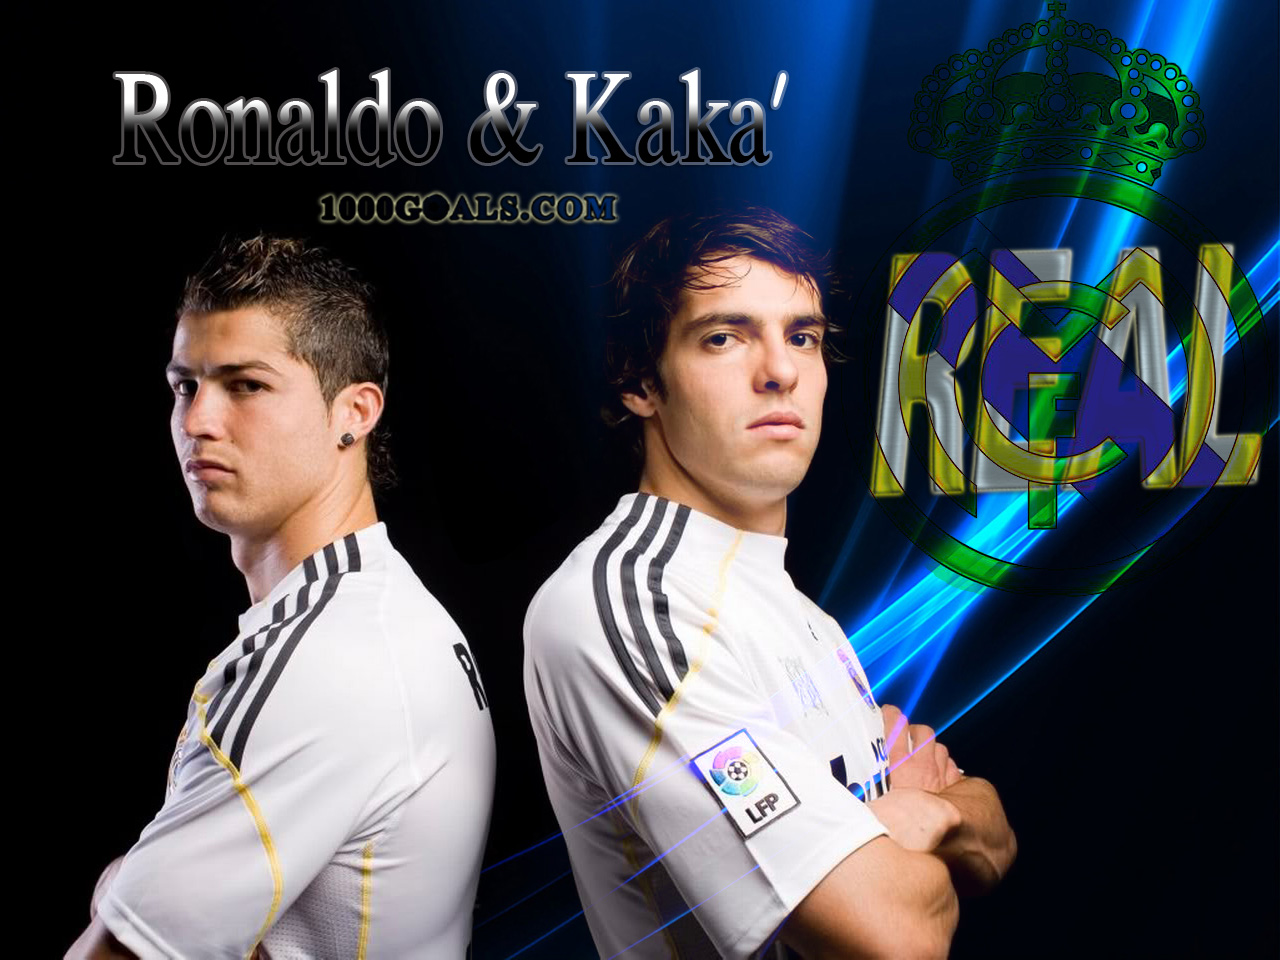 http://3.bp.blogspot.com/-BV0y0QWjY3w/TckRpizDm3I/AAAAAAAAABg/lv41p43zyZs/s1600/Cristiano-Ronaldo-Kaka-Wallpaper.jpg